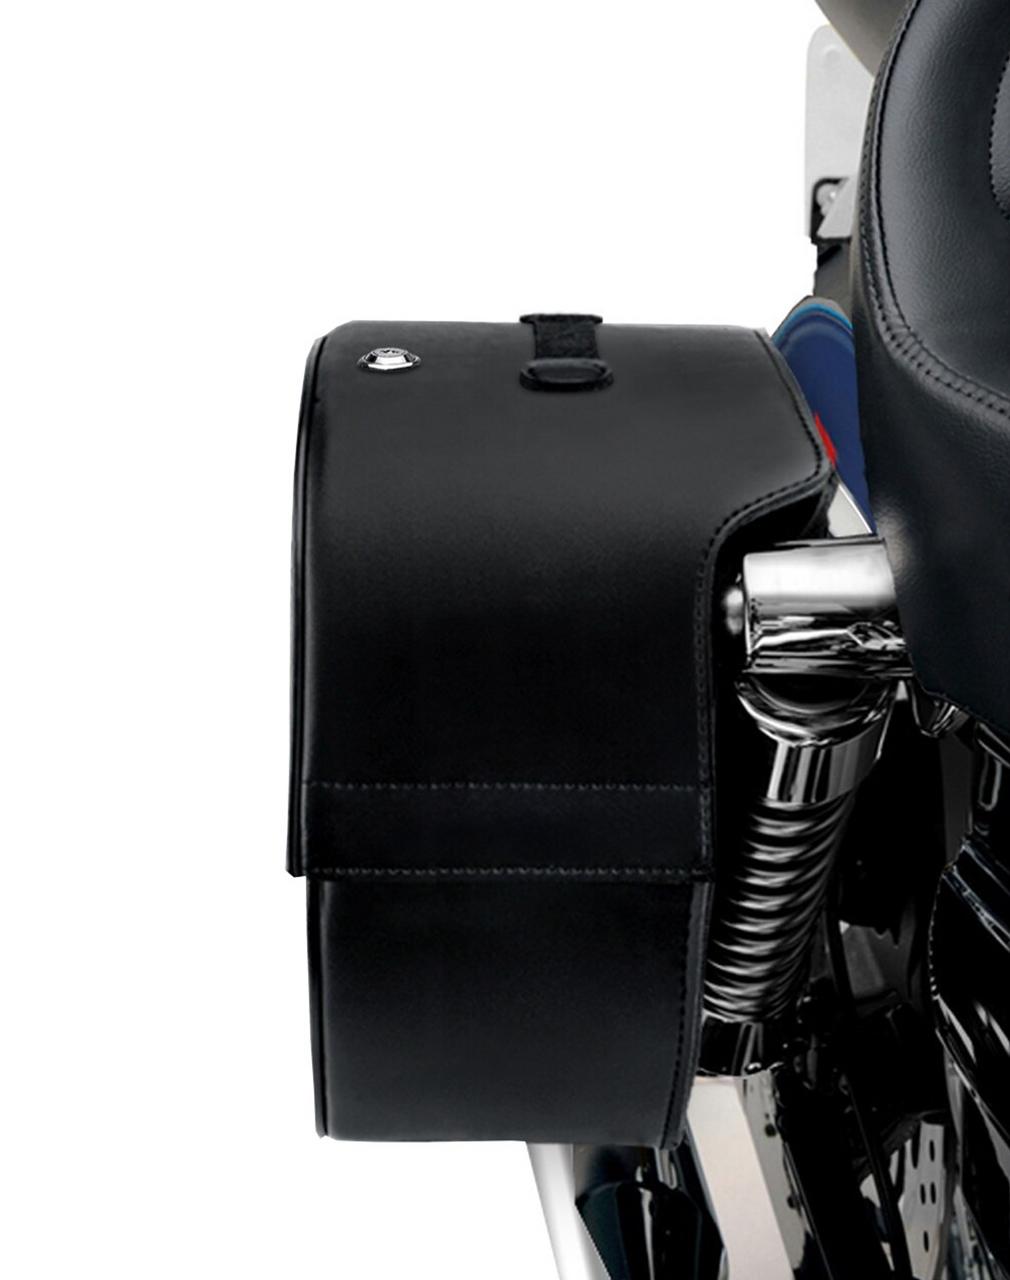 VikingBags Armor Large Single Strap Shock Cutout Studded Honda Shadow Aero ABS VT750CS Leather Motorcycle Saddlebags Shock Cutout View